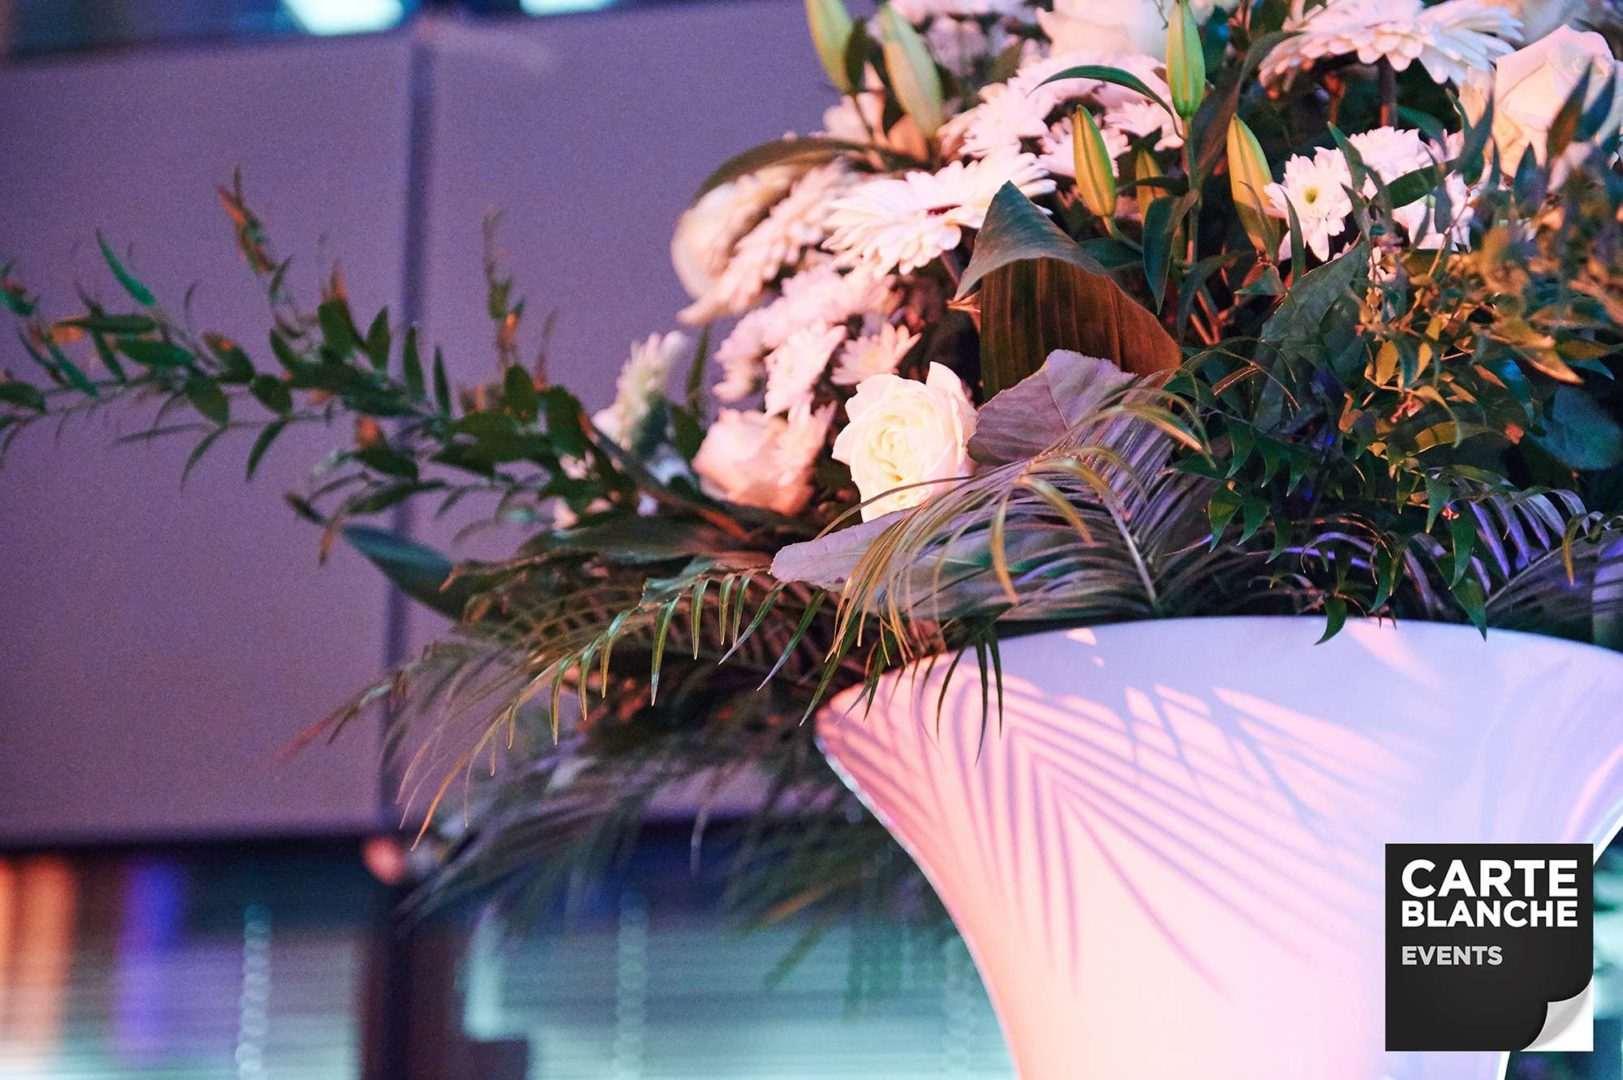 xmas-degroof-petercam-2015-066-luxembourg-event